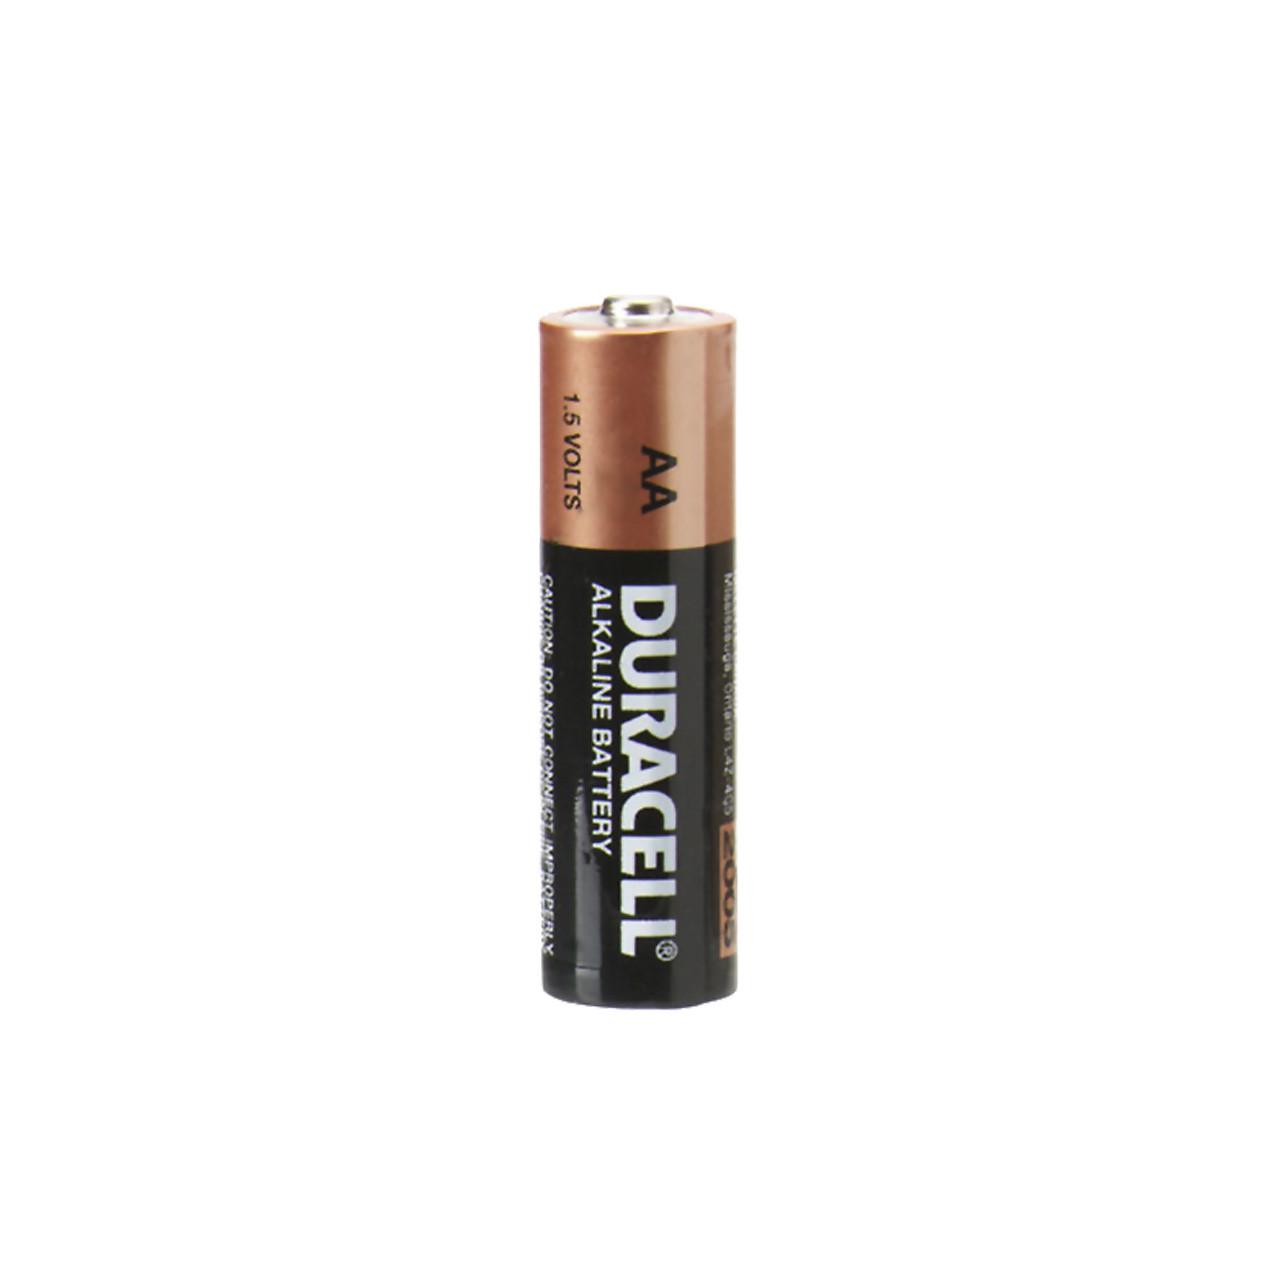 Duracell Quot Aa Quot Battery 10 Year Shelf Life Emergencykits Com